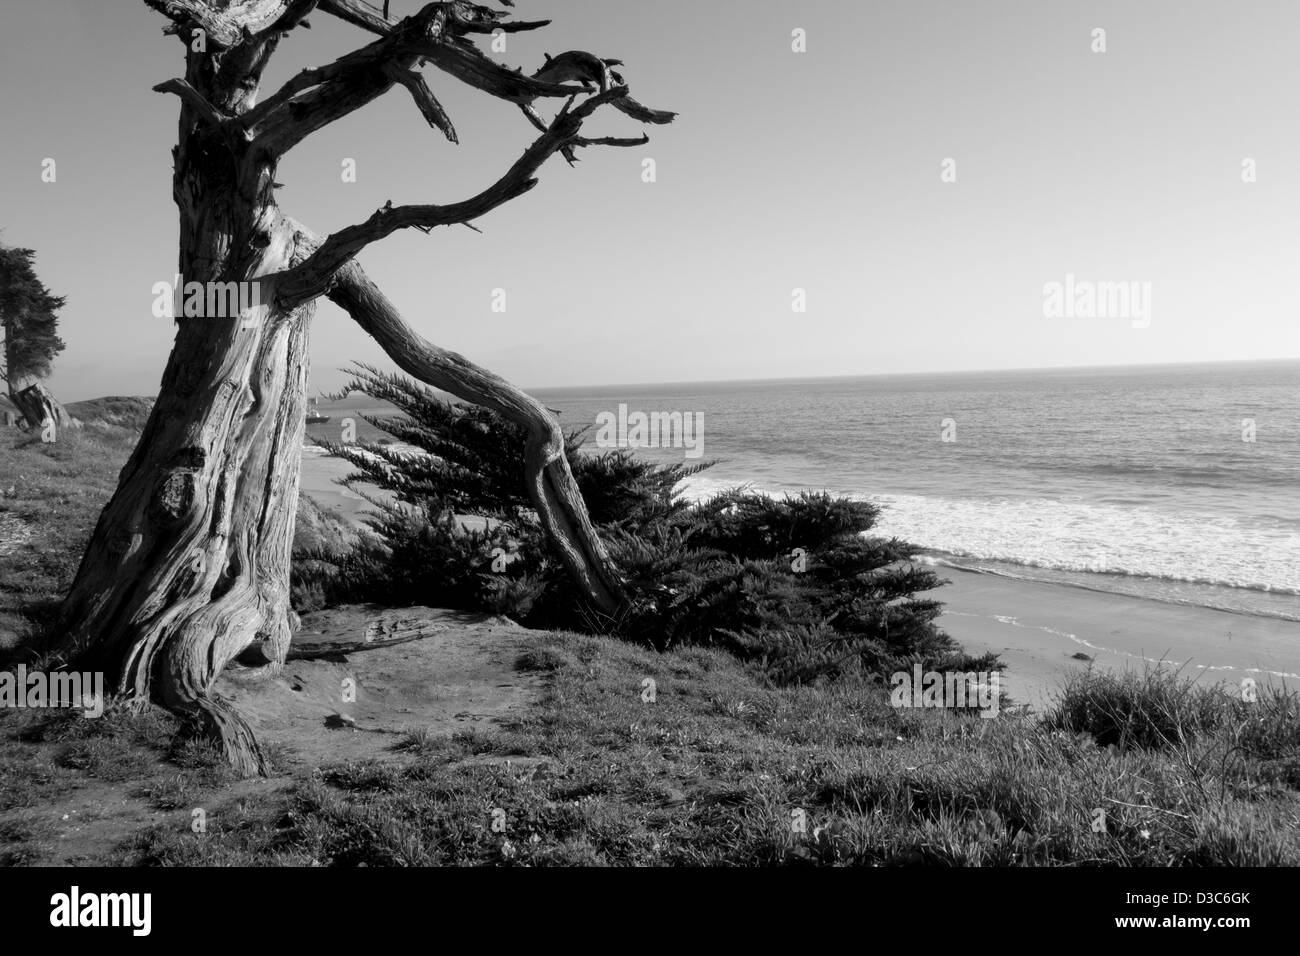 dead tree on bluffs above beach overlooking Pacific Ocean near Carpinteria California USA - Stock Image